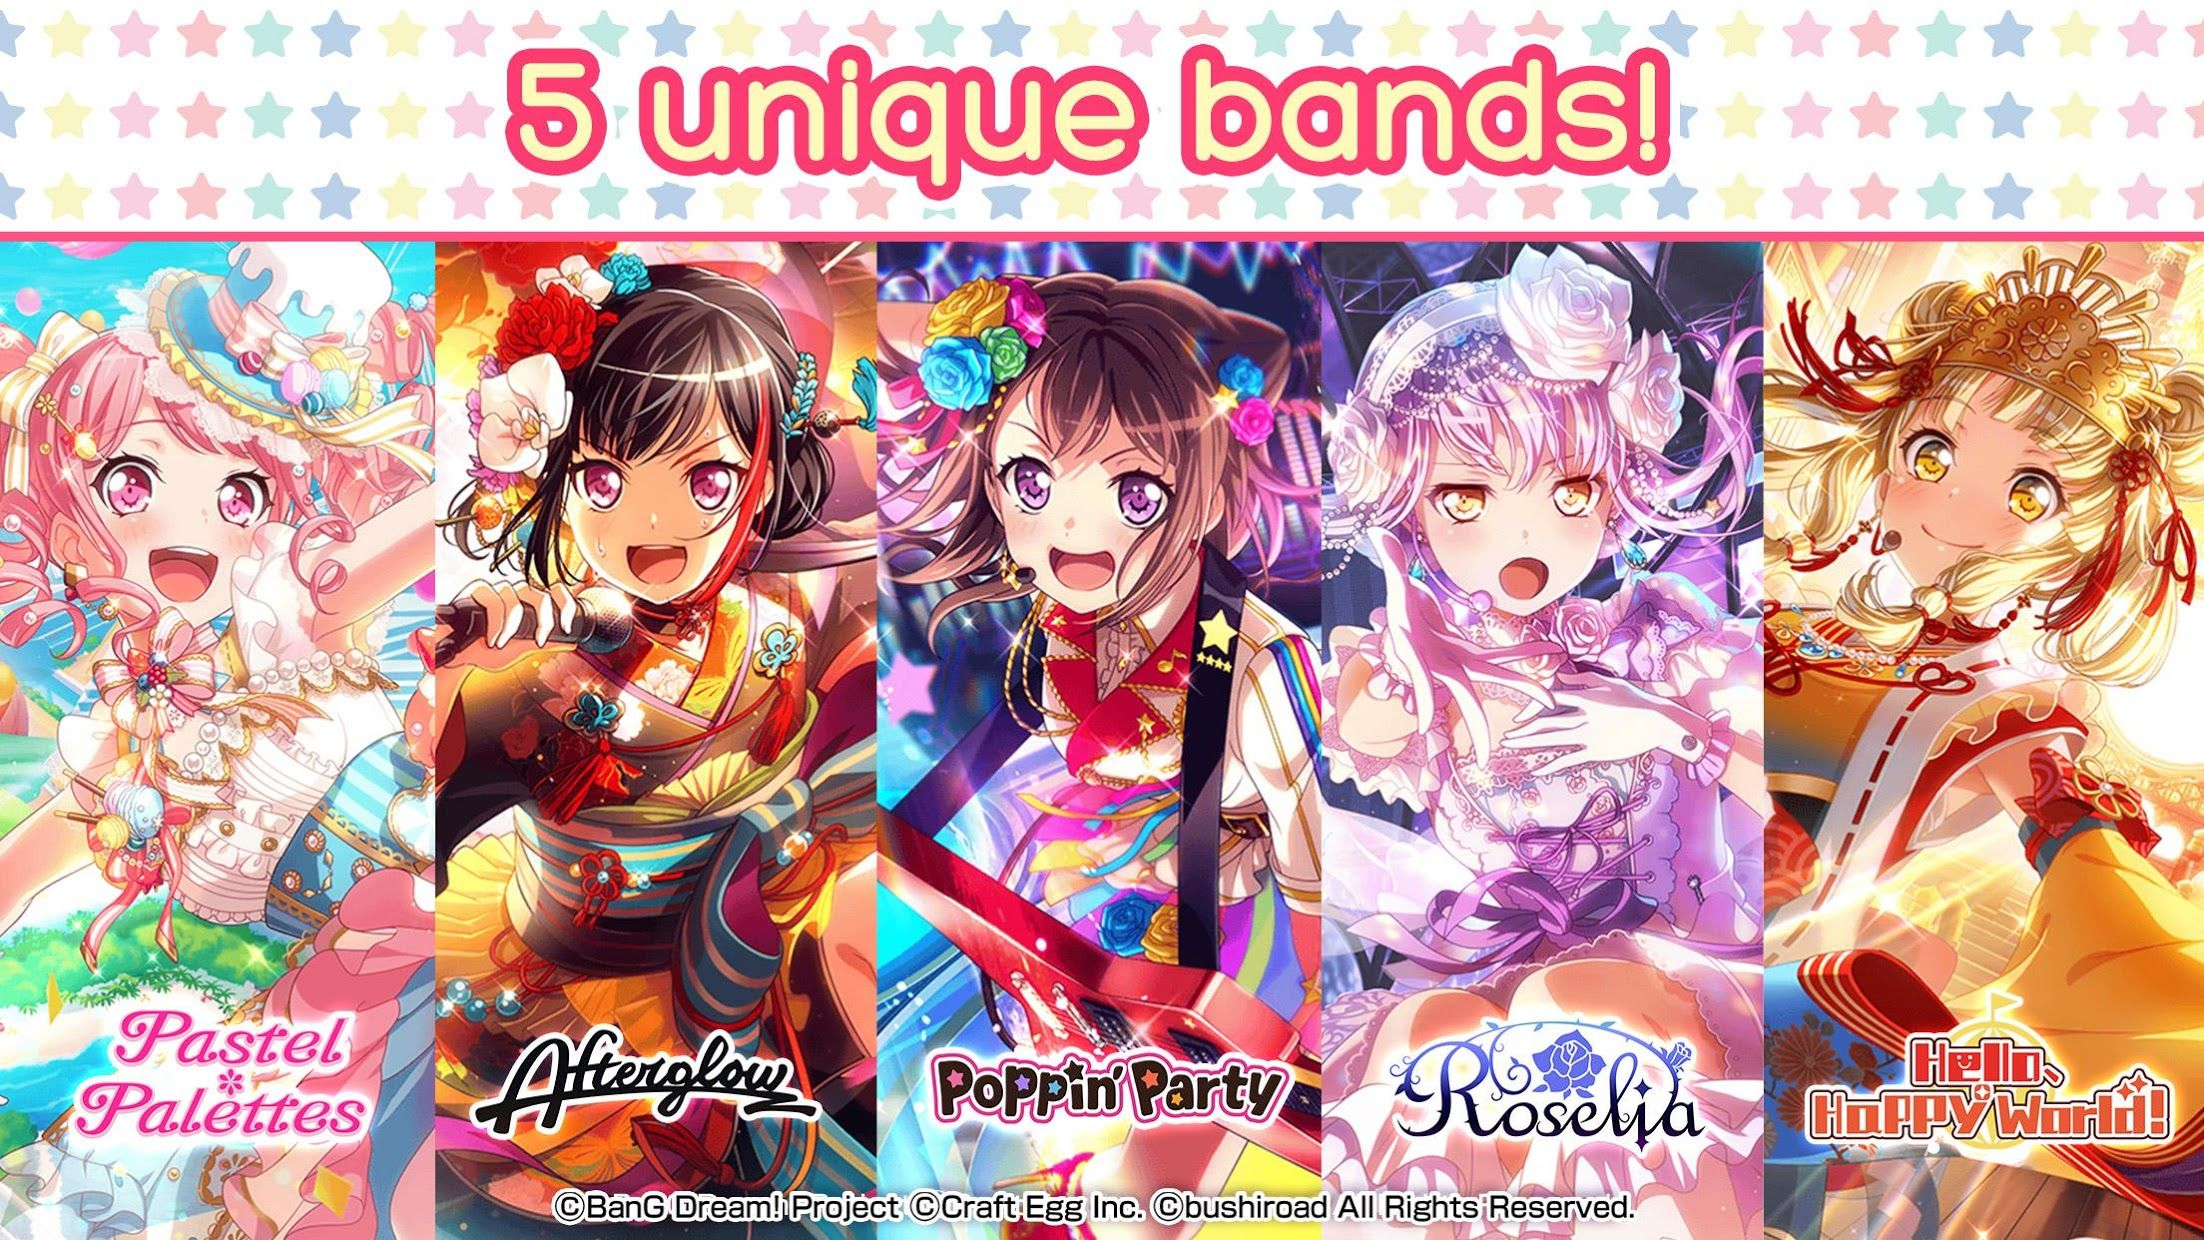 BanG Dream!少女乐团派对!(国际服) 游戏截图2